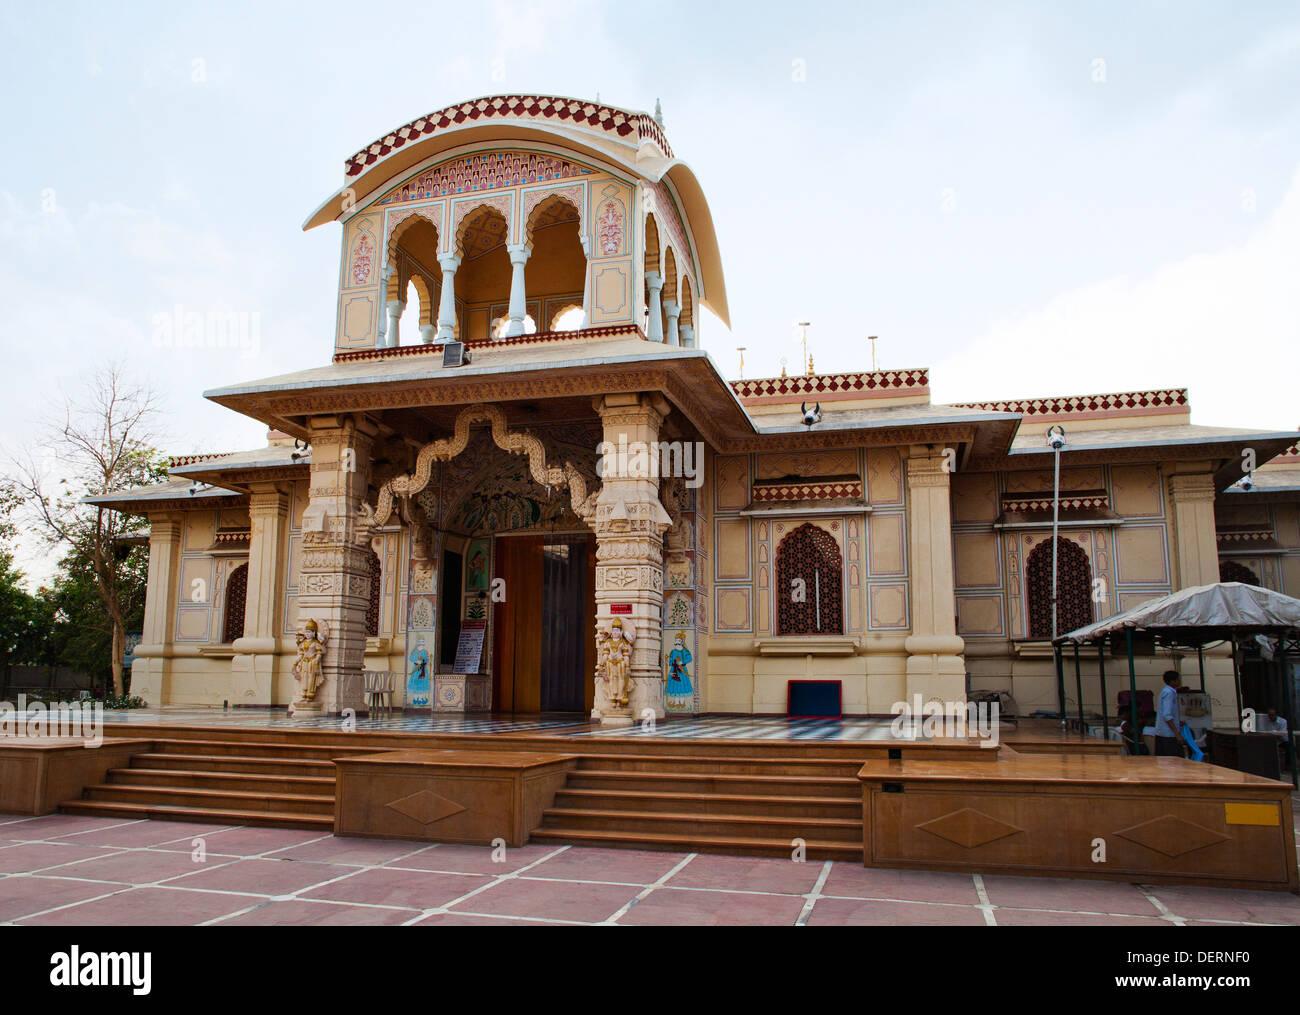 Facade of a temple, Iskcon Temple, Ahmedabad, Gujarat, India - Stock Image